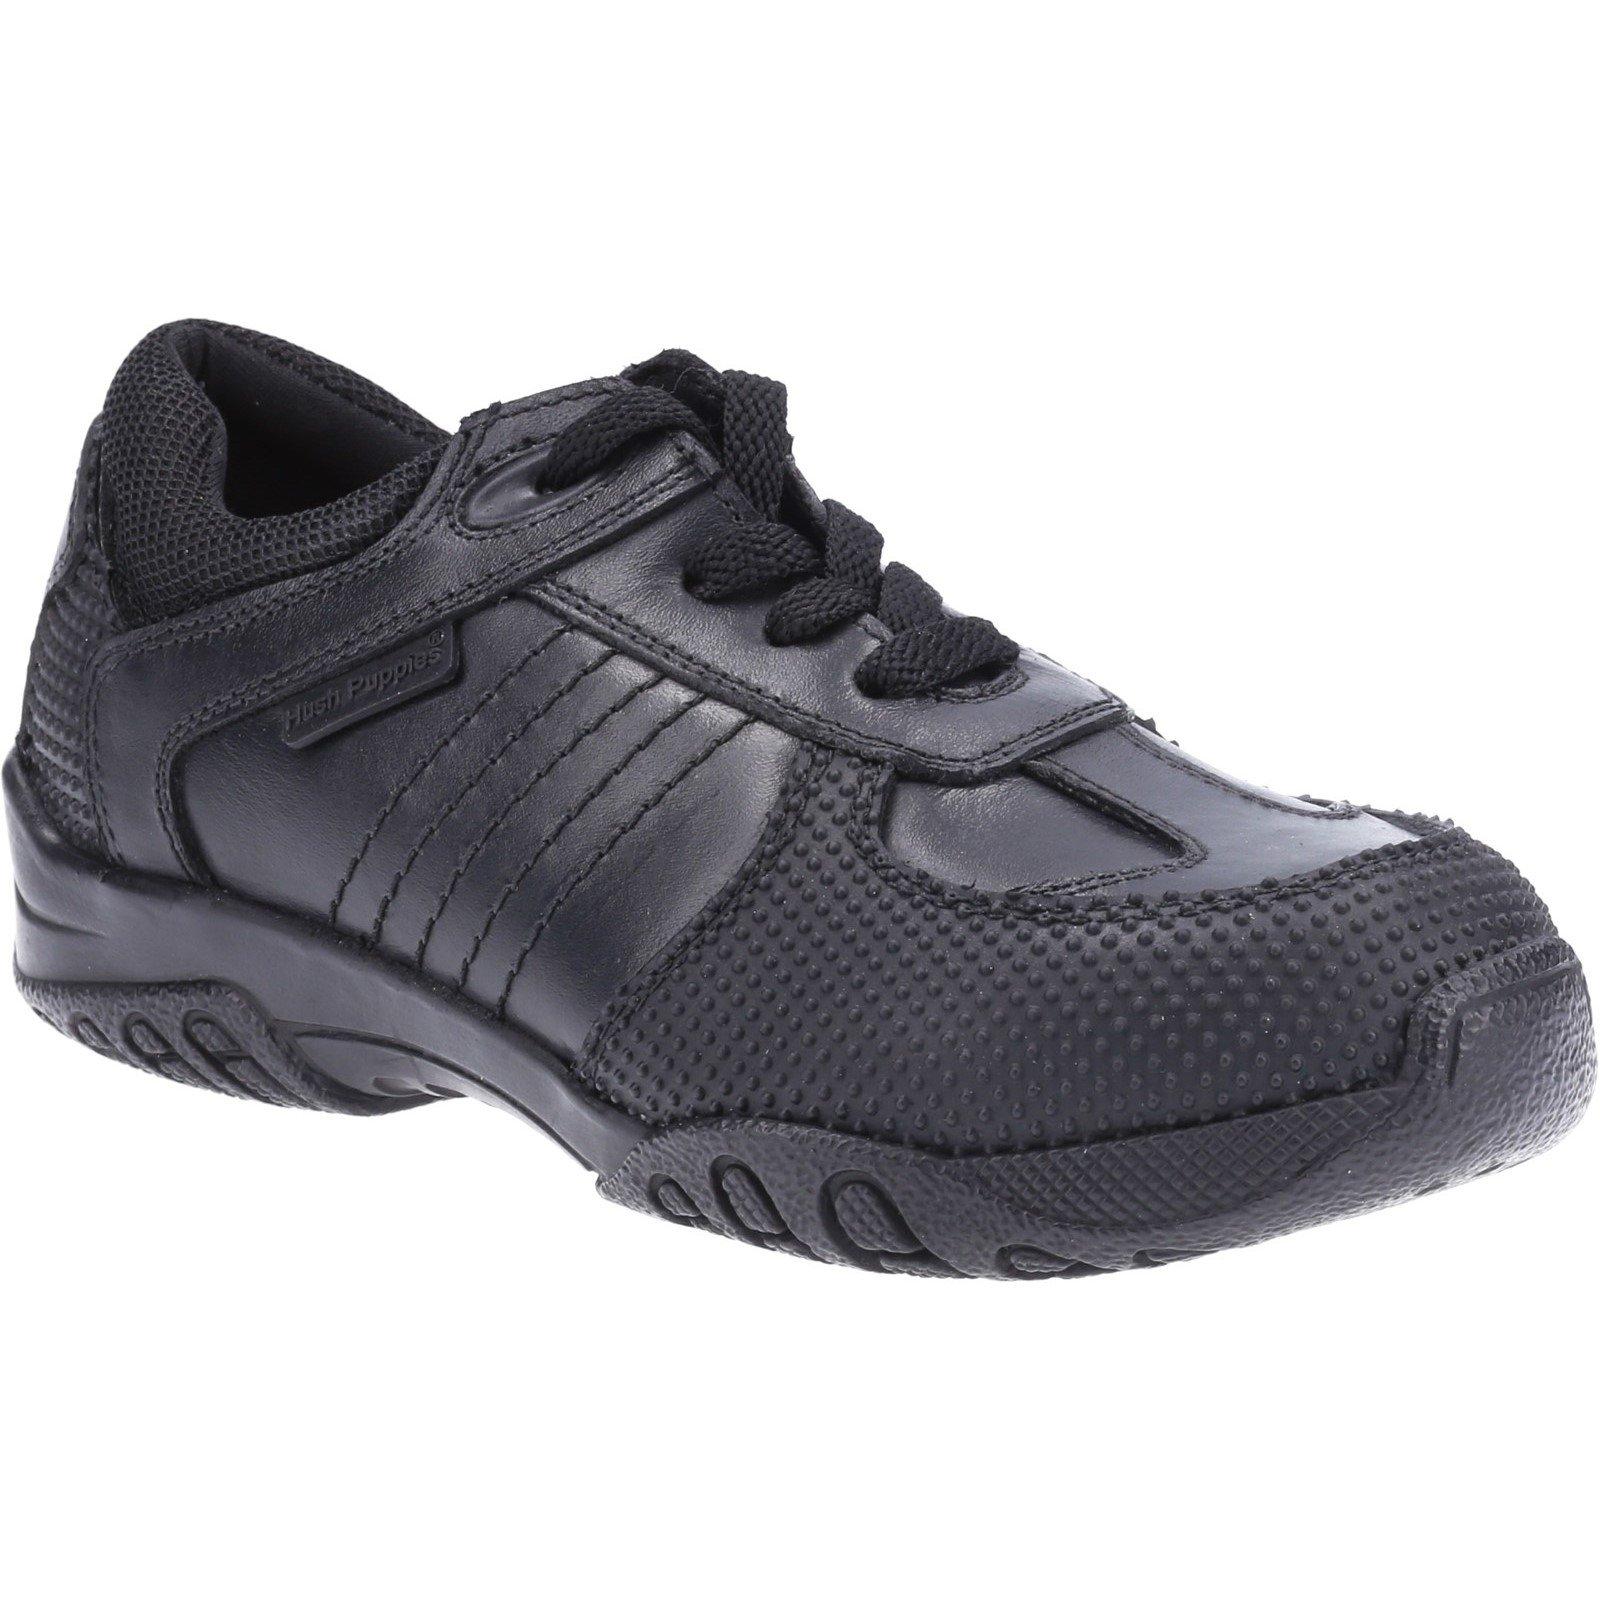 Hush Puppies Kid's Jezza Junior School Shoe Black 32587 - Black 11